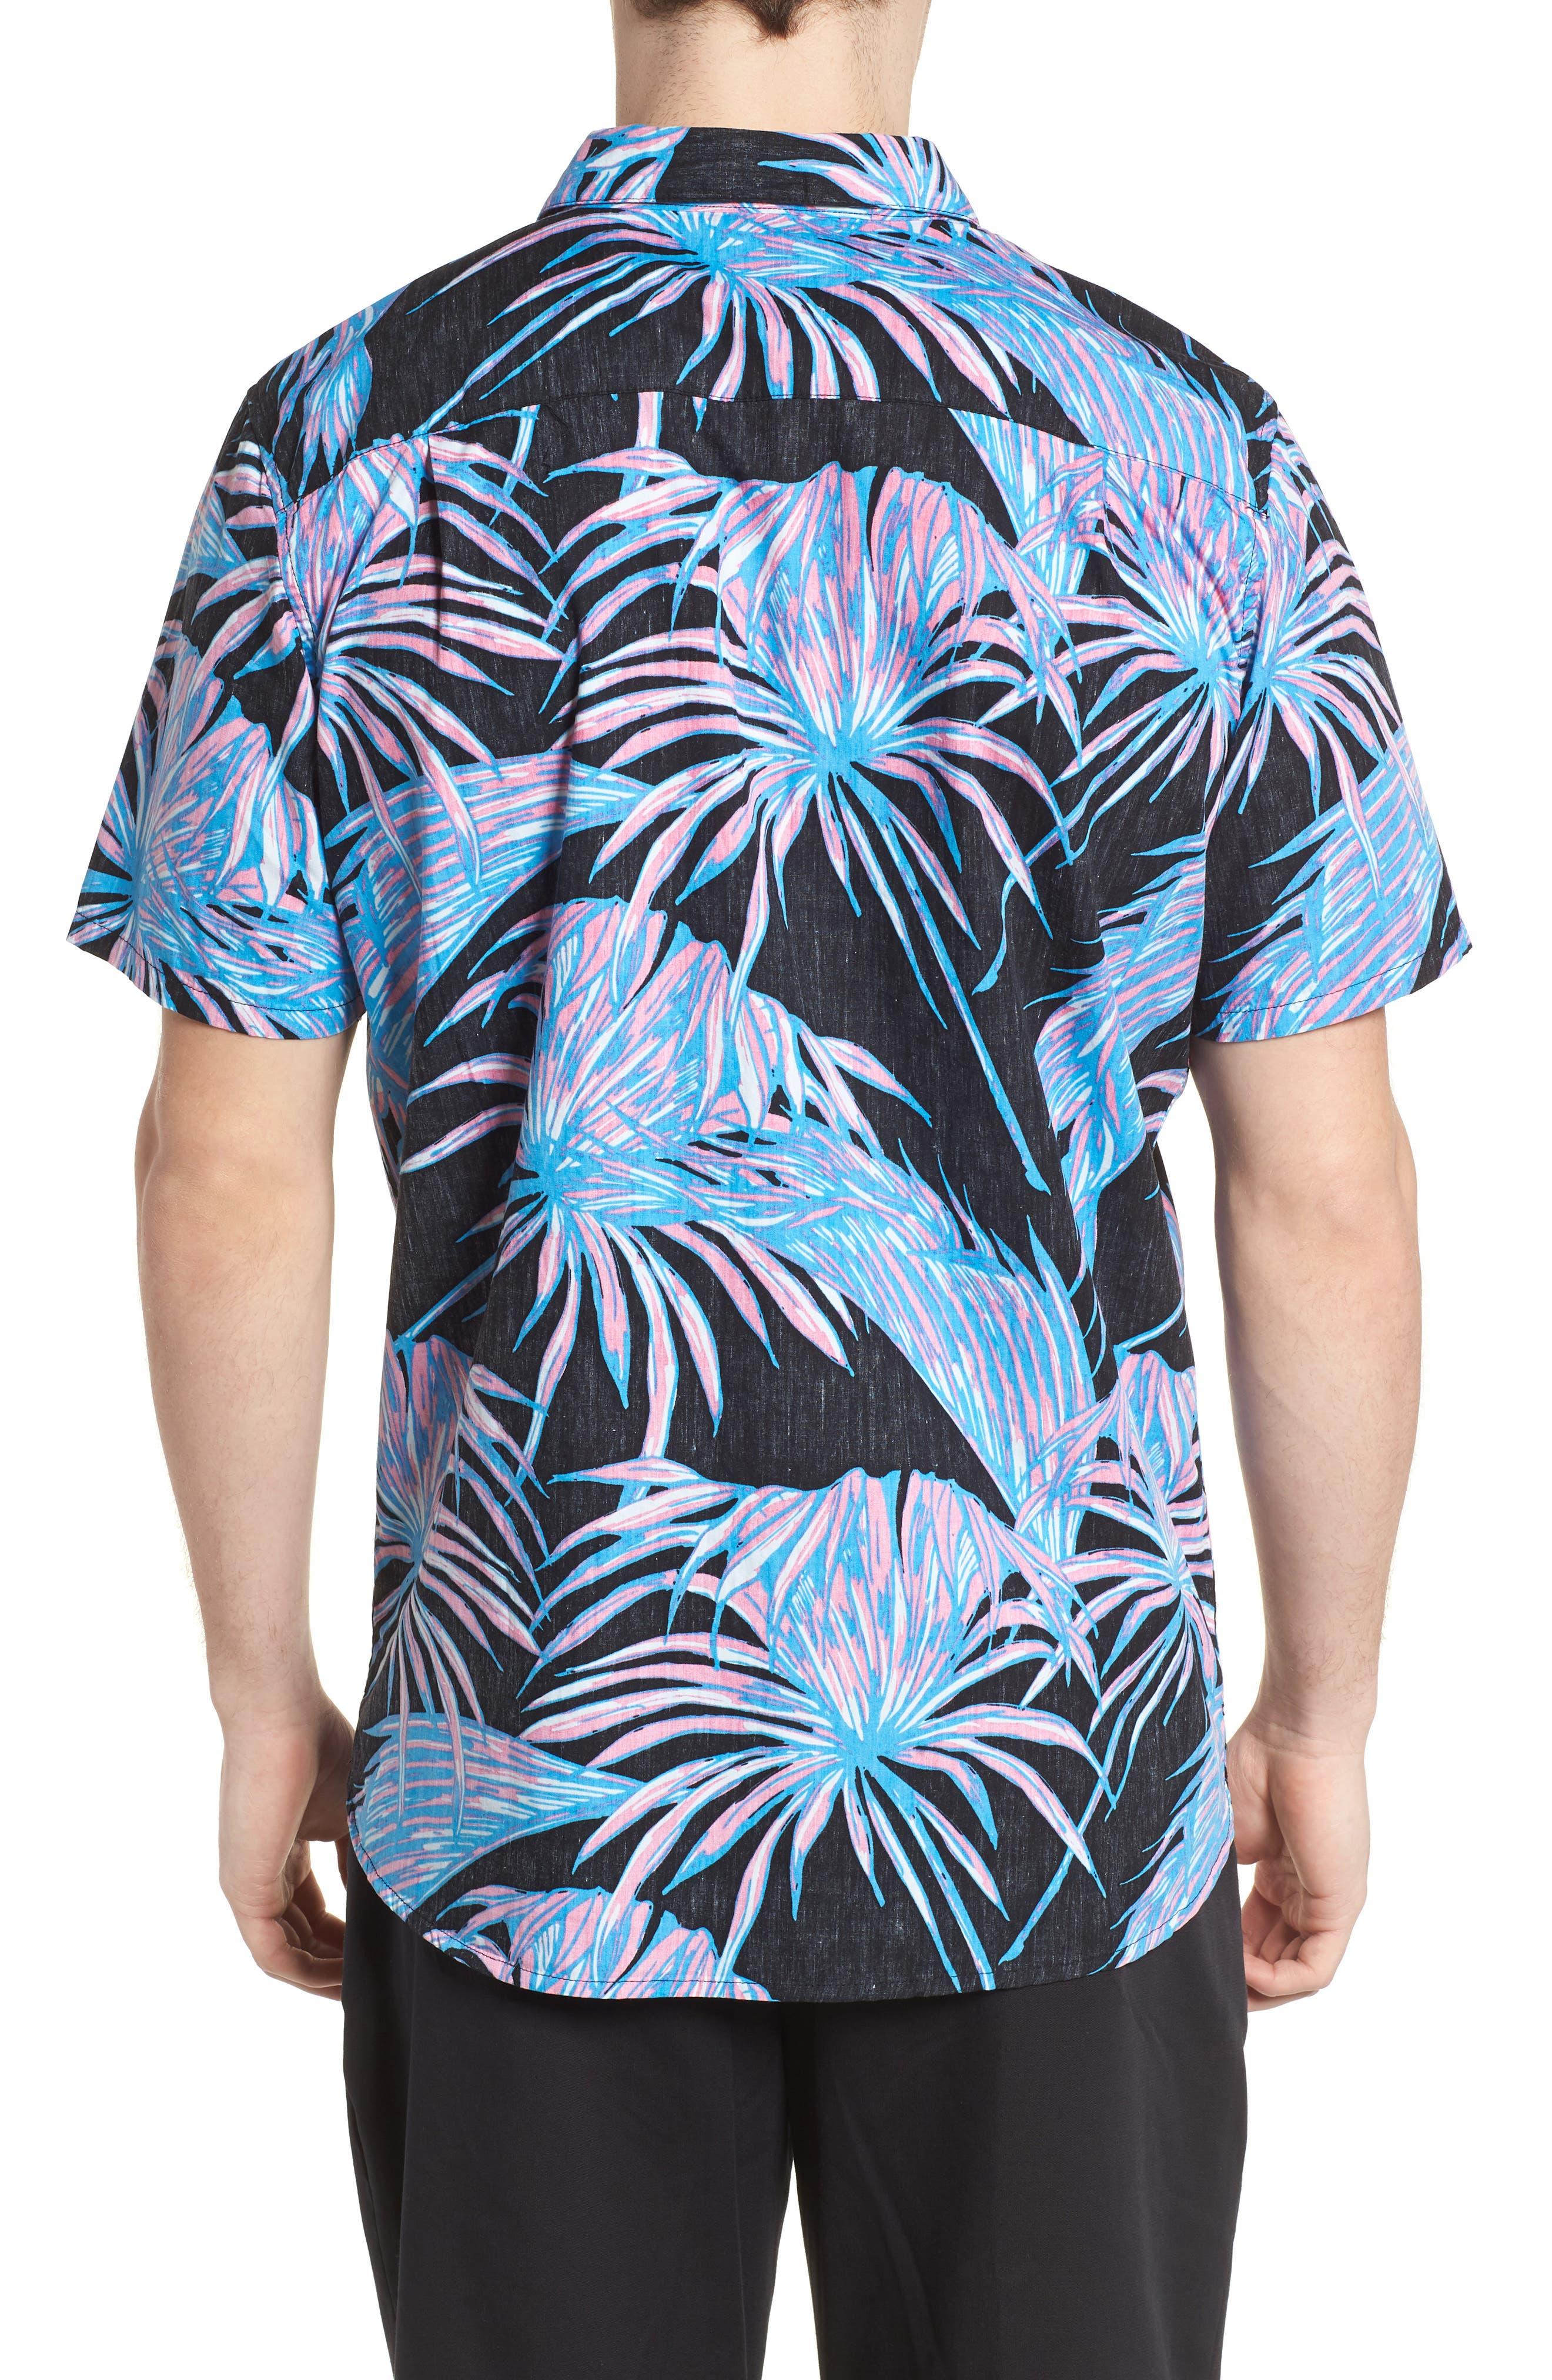 Koko Shirt,                             Alternate thumbnail 2, color,                             Black